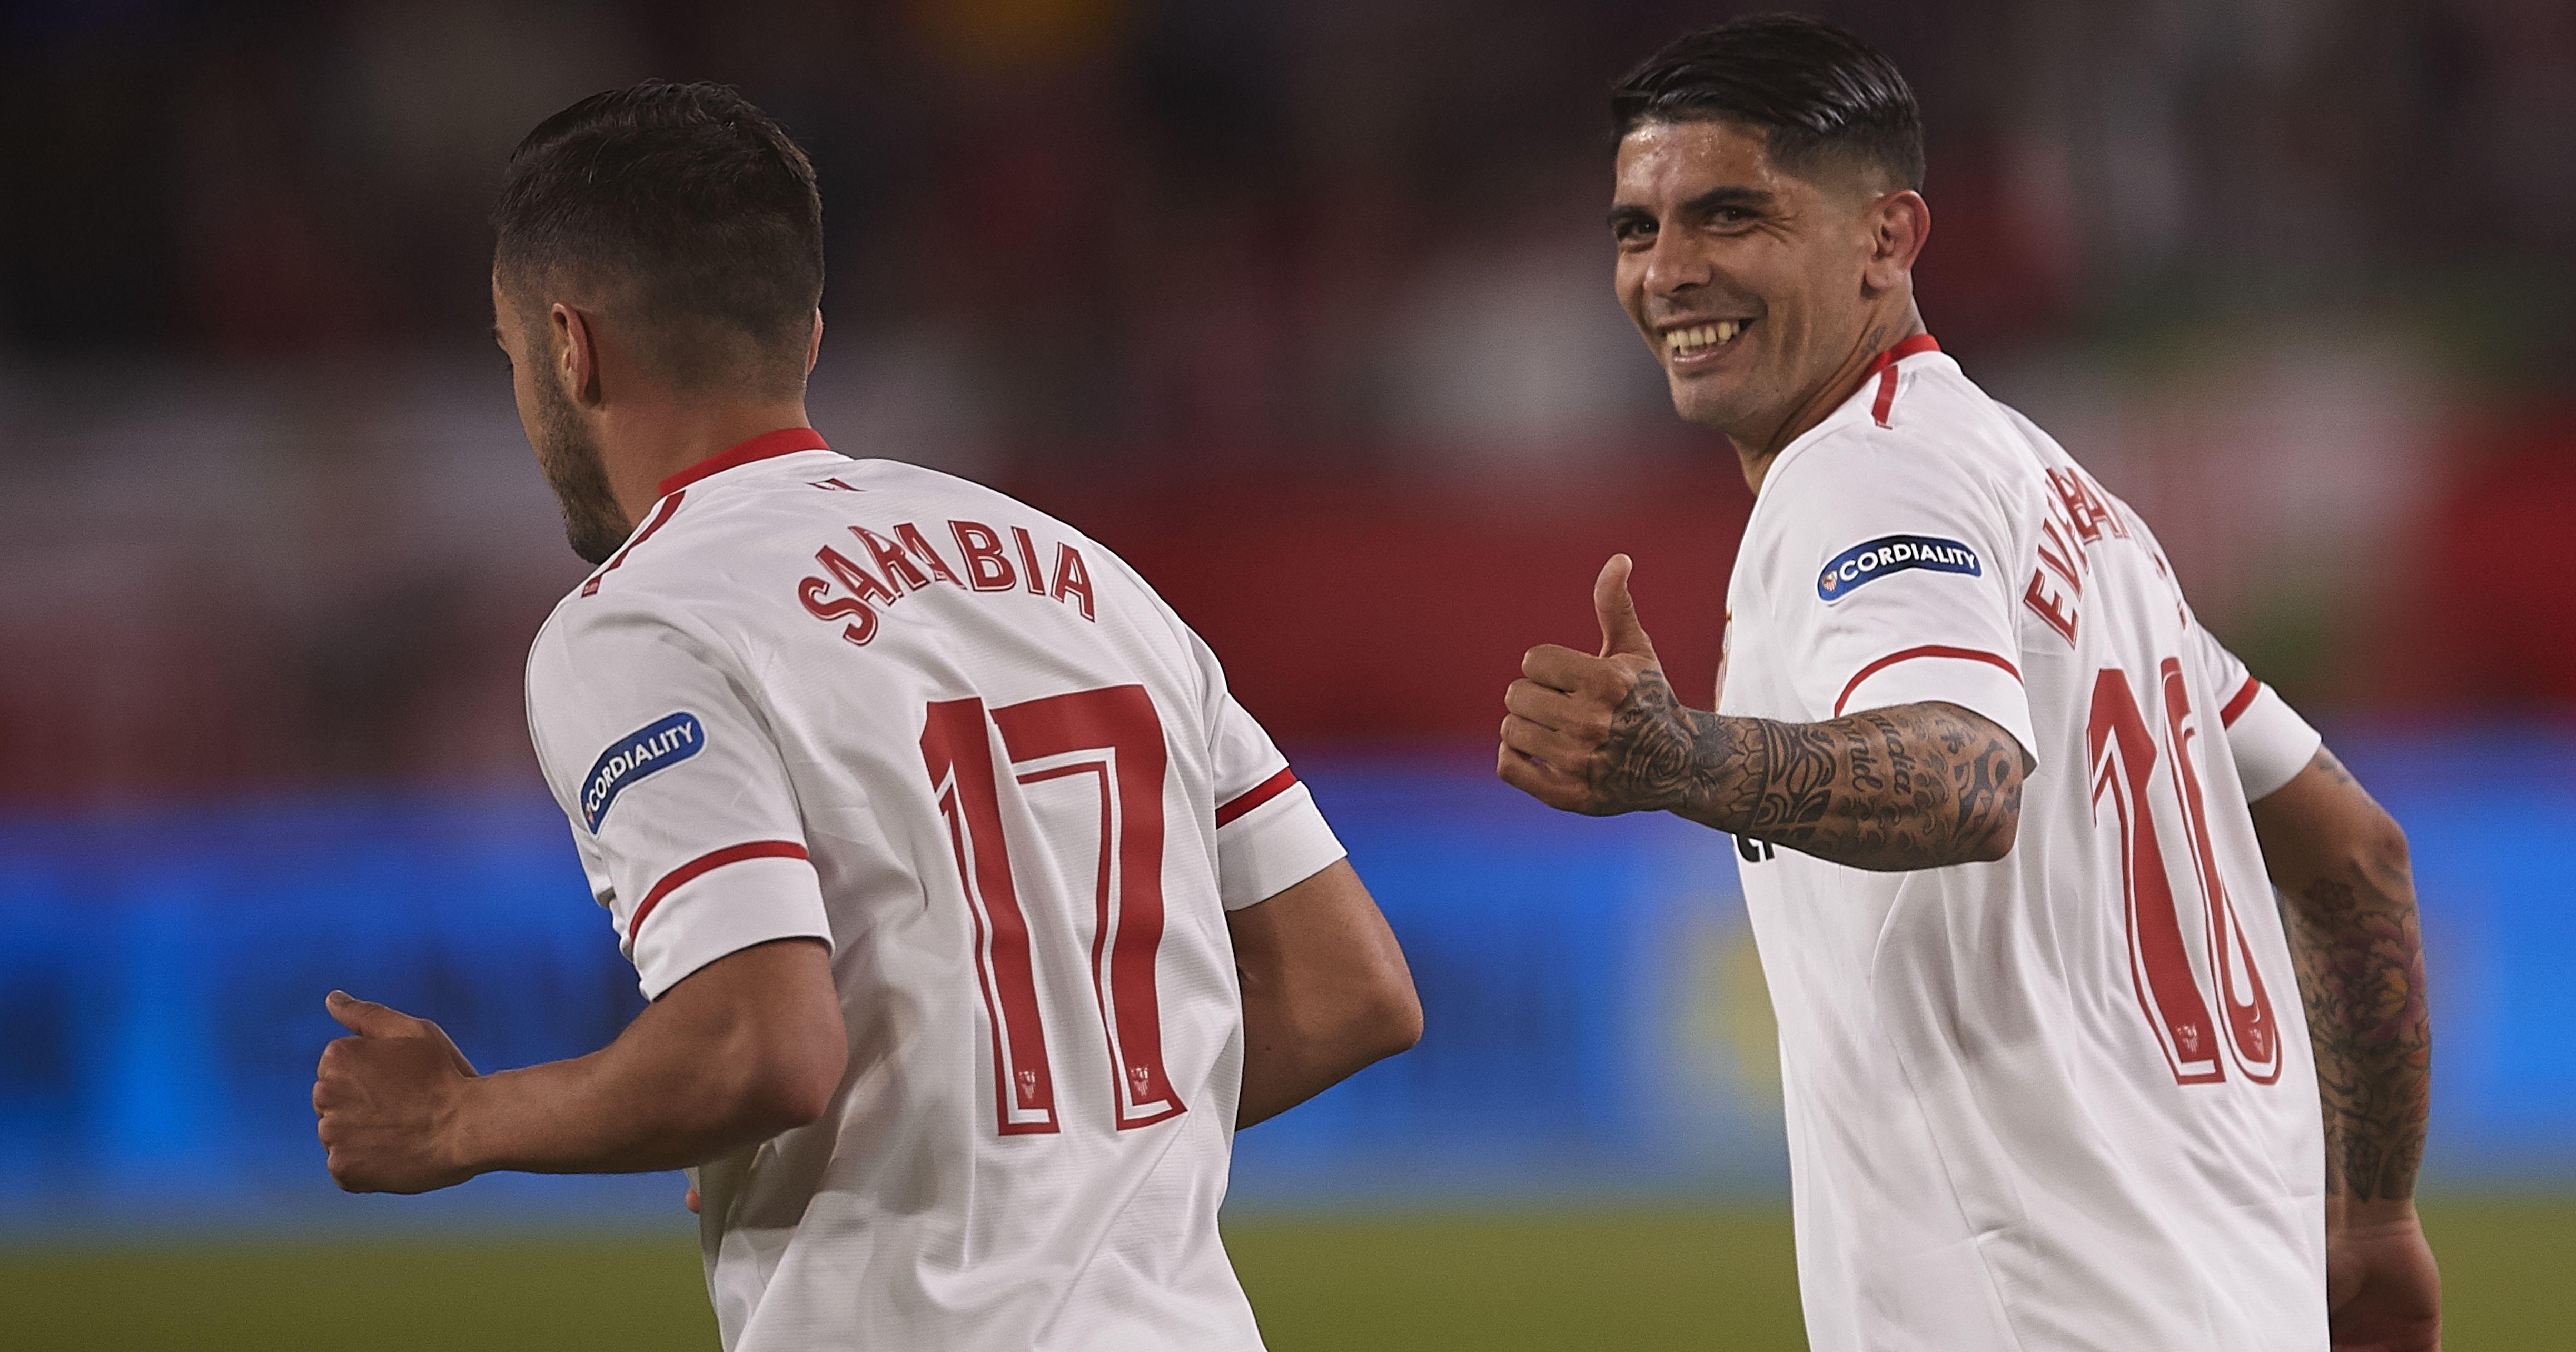 Real Madrid vs. Sevilla: EN DIRECTO EN VIVO por la Liga Española